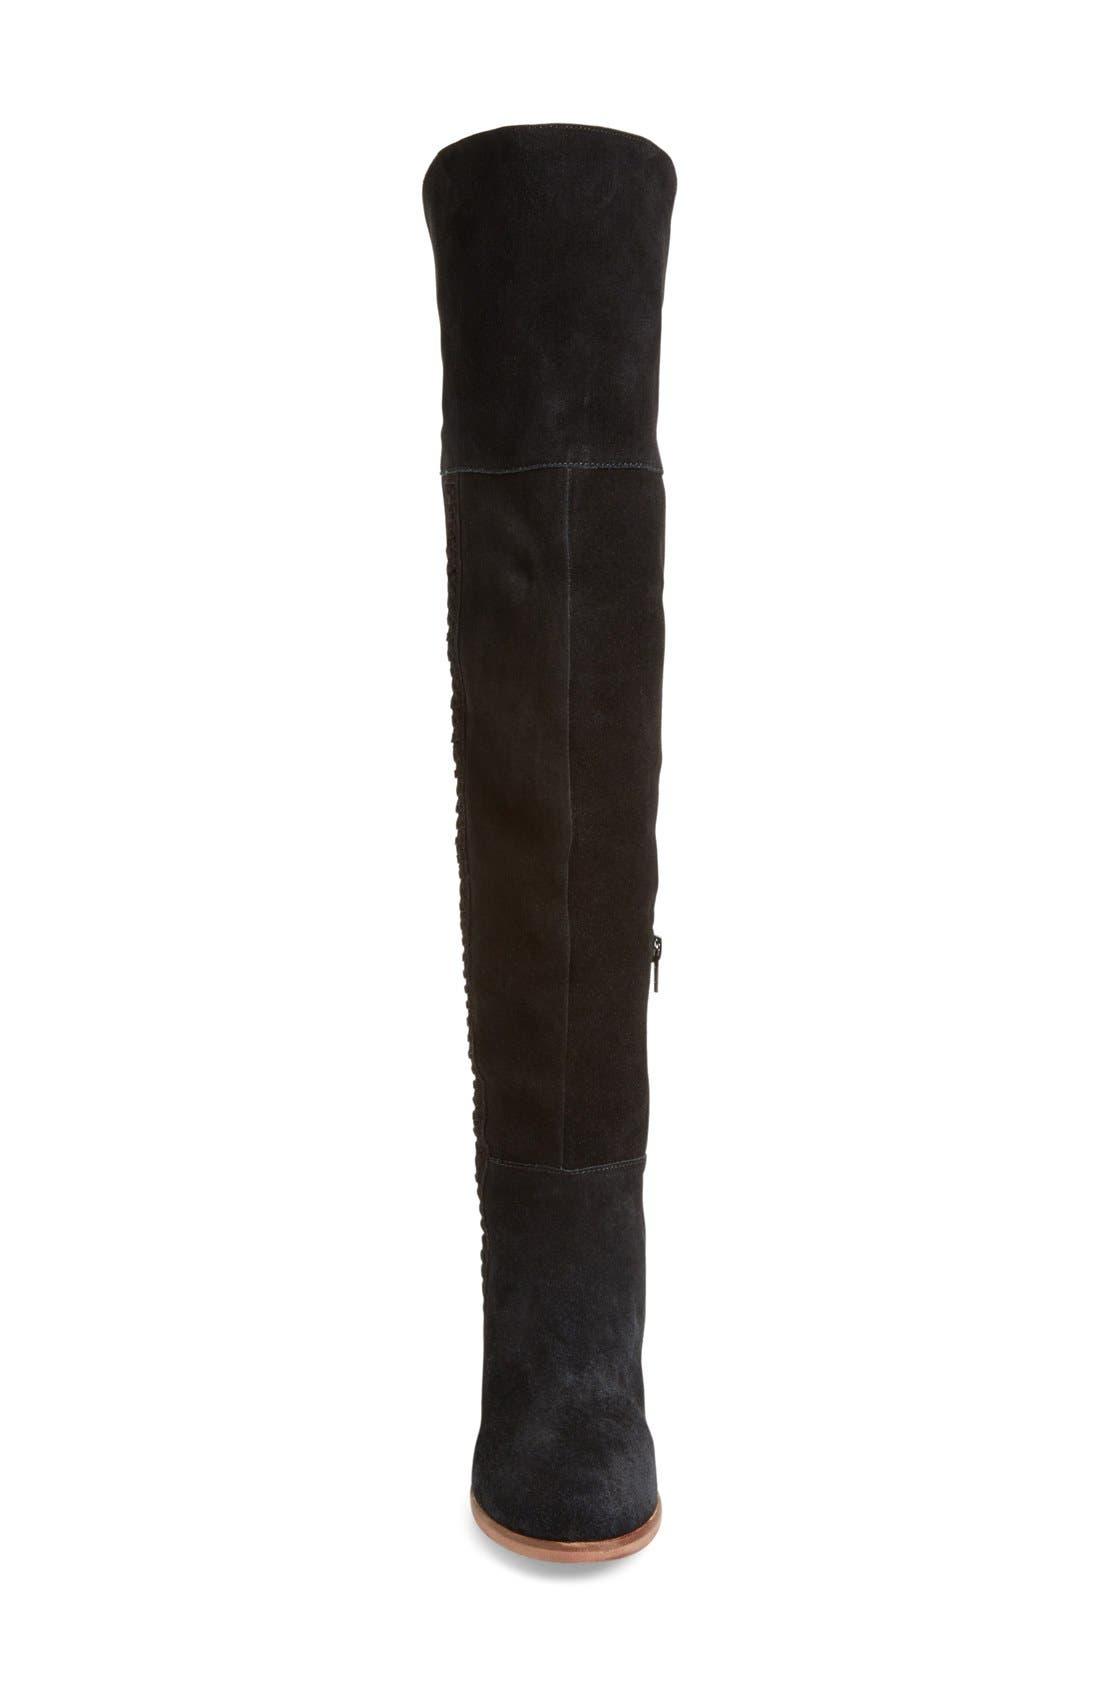 Alternate Image 3  - Matisse Muse Tall Boot (Women) (Narrow Calf)